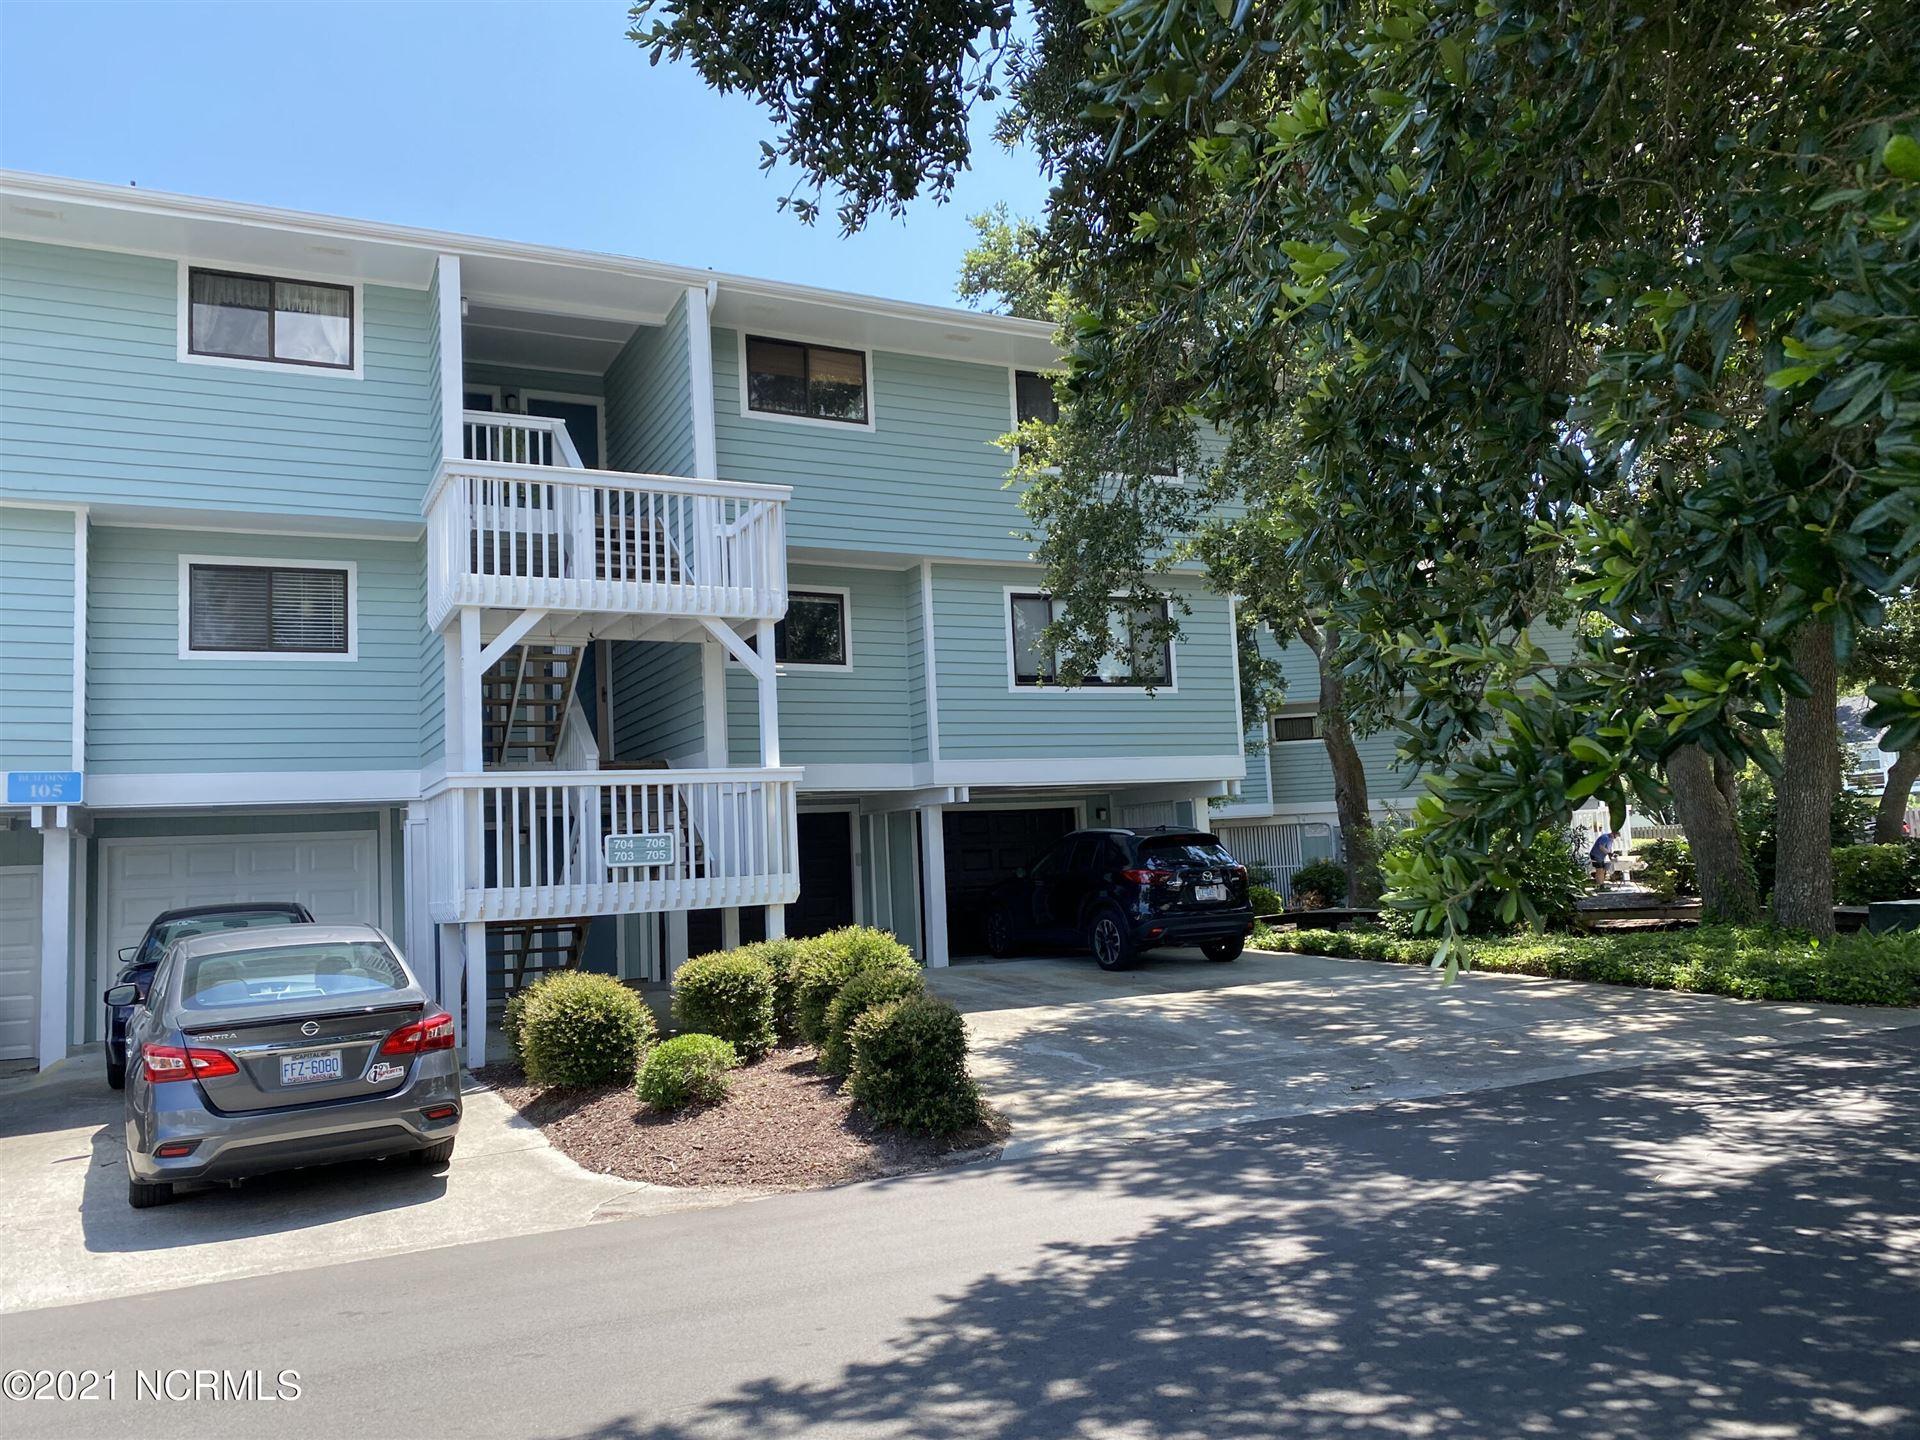 Photo for 105 Teakwood Drive #703, Carolina Beach, NC 28428 (MLS # 100280616)